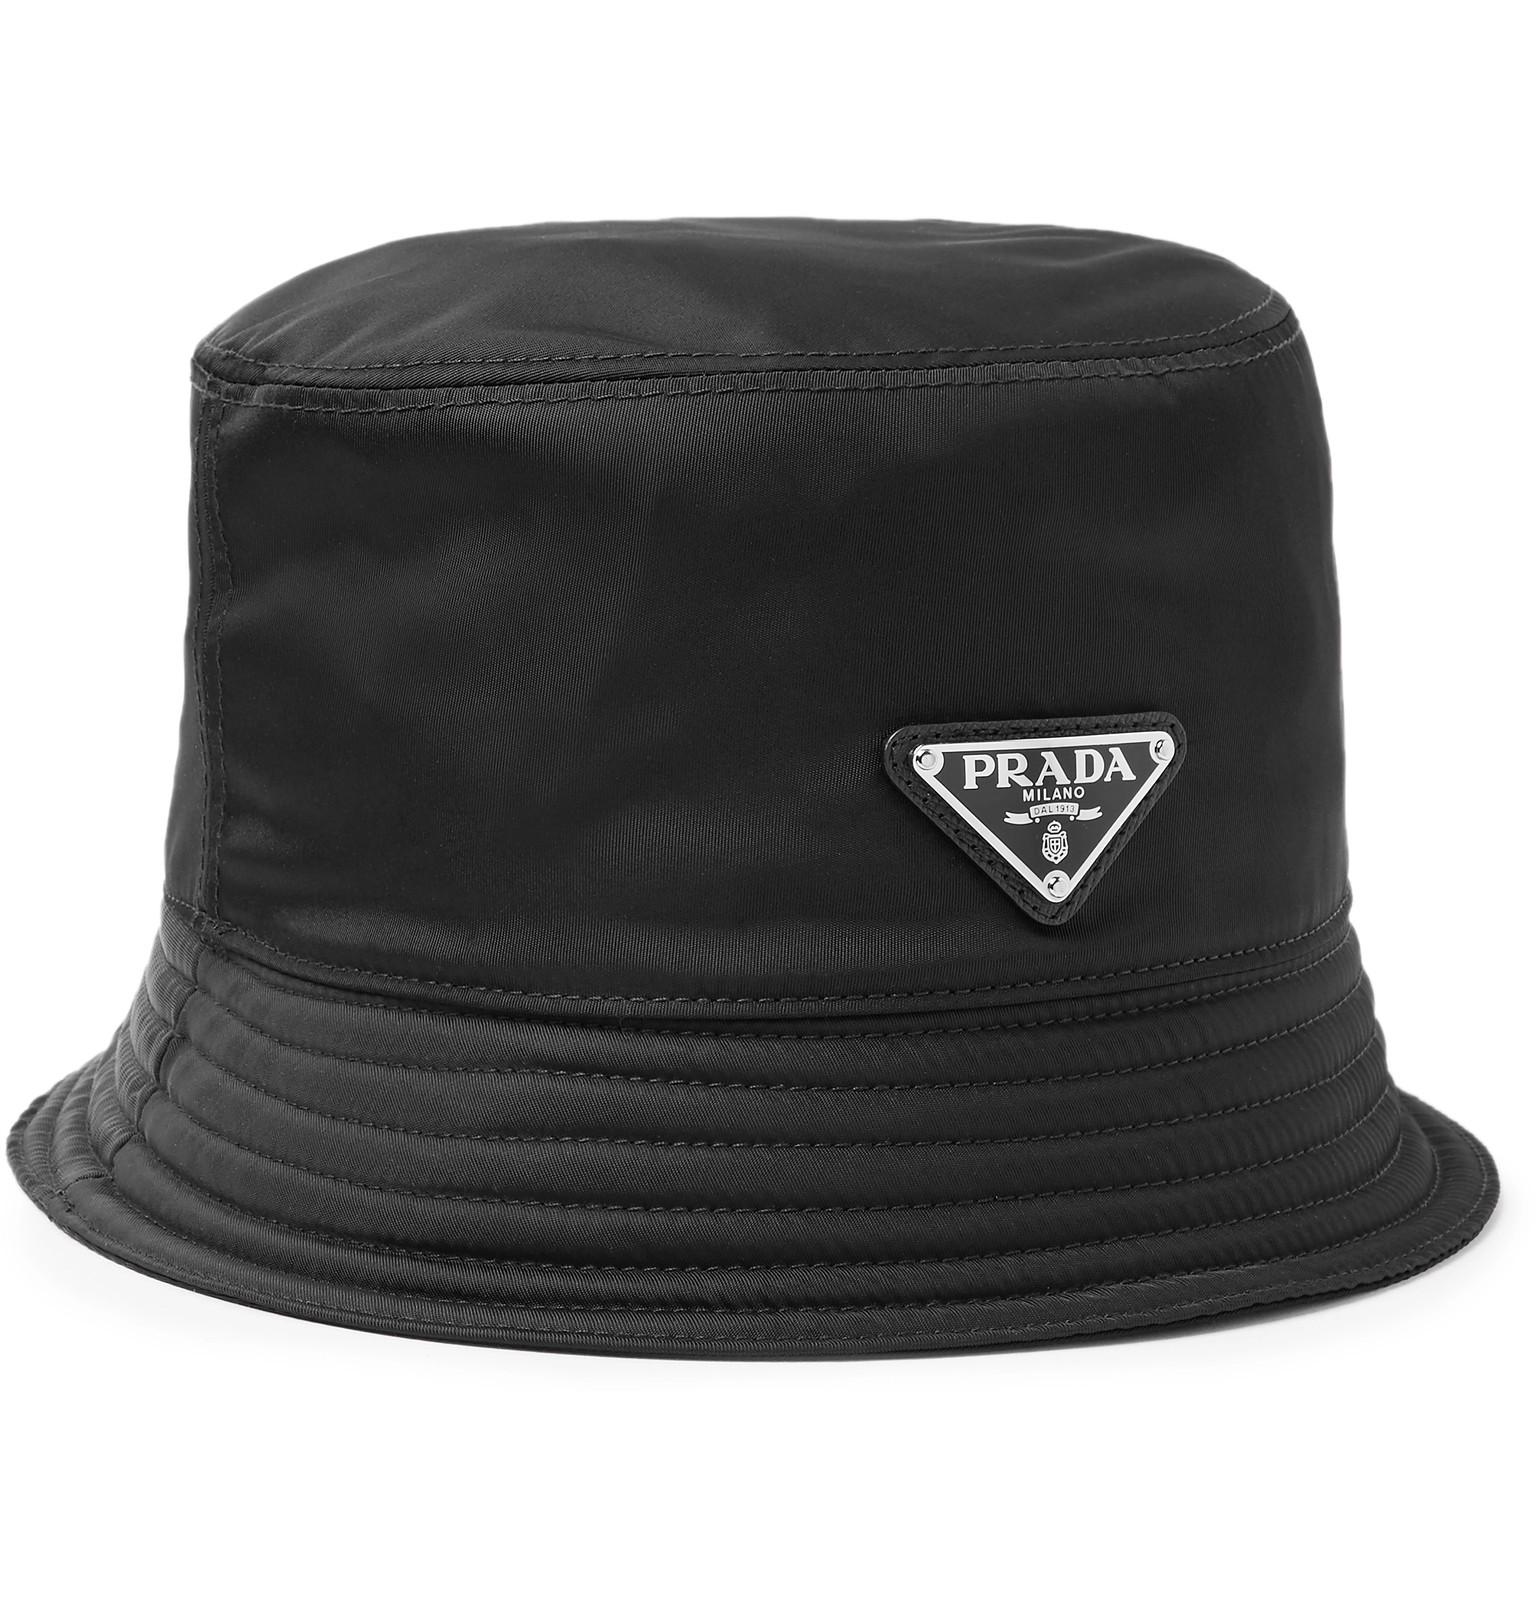 Prada - Logo-Appliquéd Nylon Bucket Hat 6be141369b9